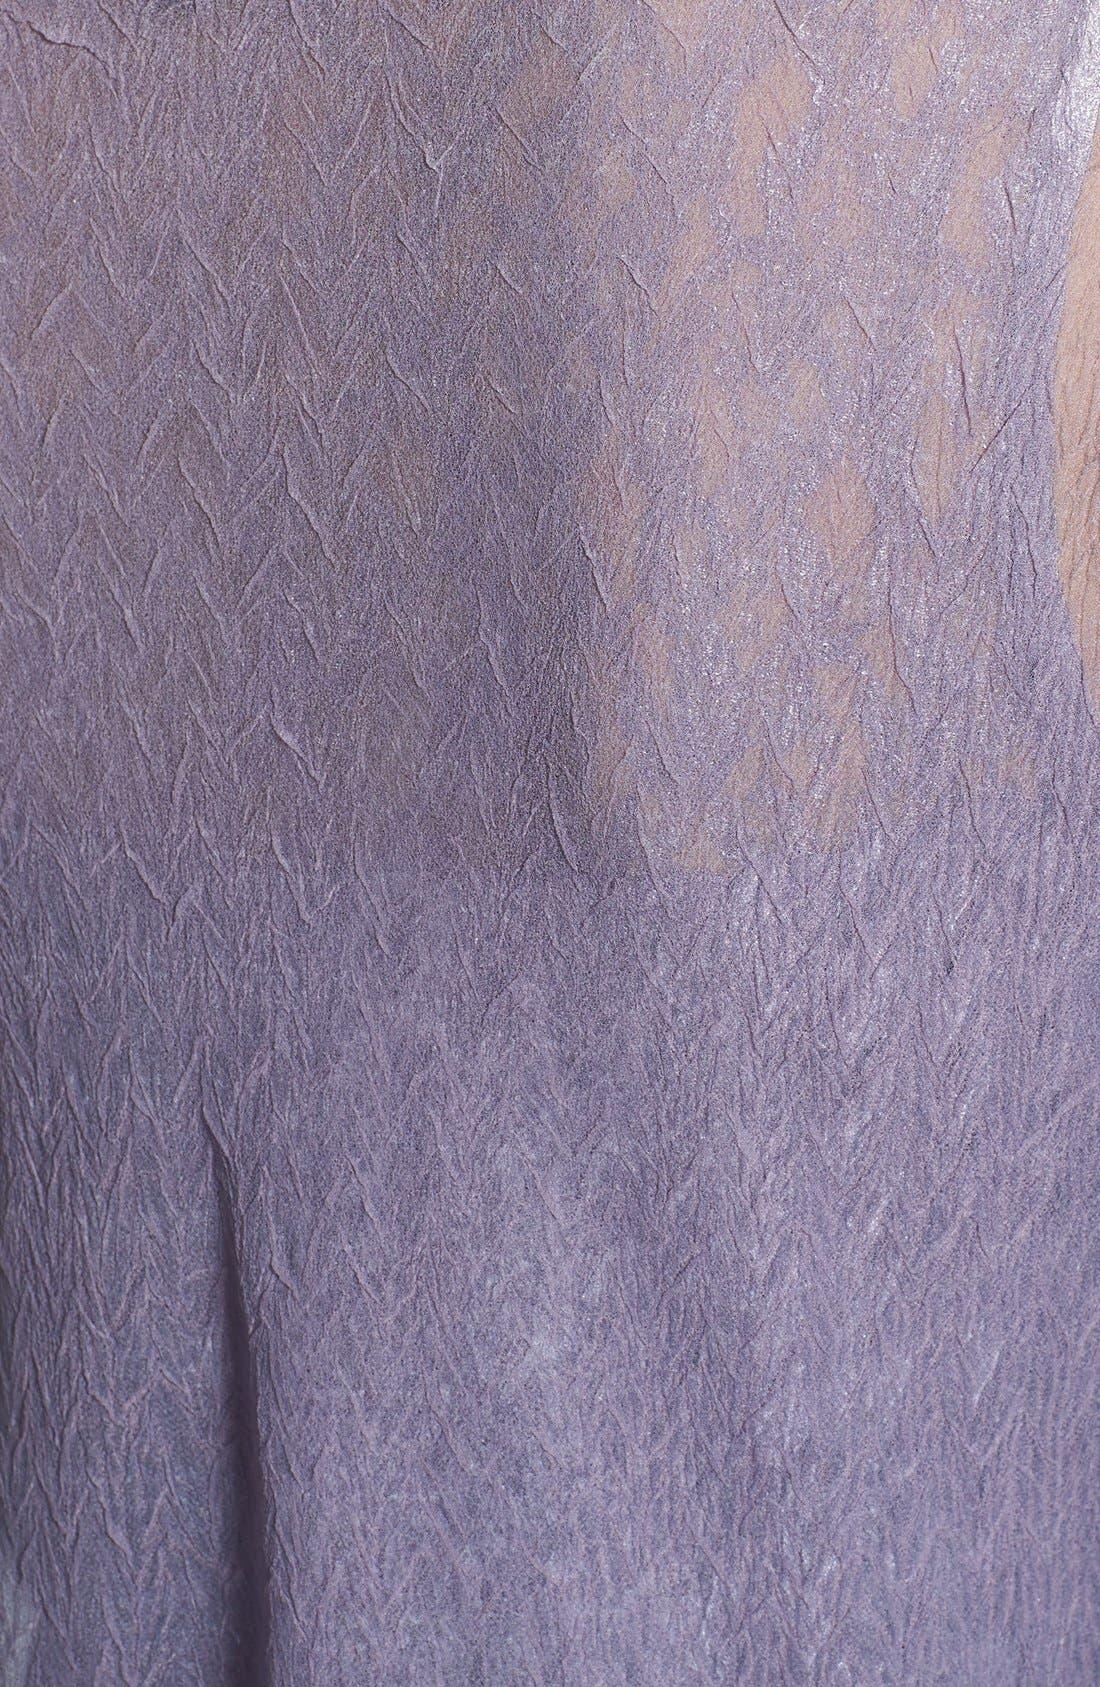 Beaded Neck Charmeuse Dress & Jacket,                             Alternate thumbnail 4, color,                             PURPLE ASH OMBRE